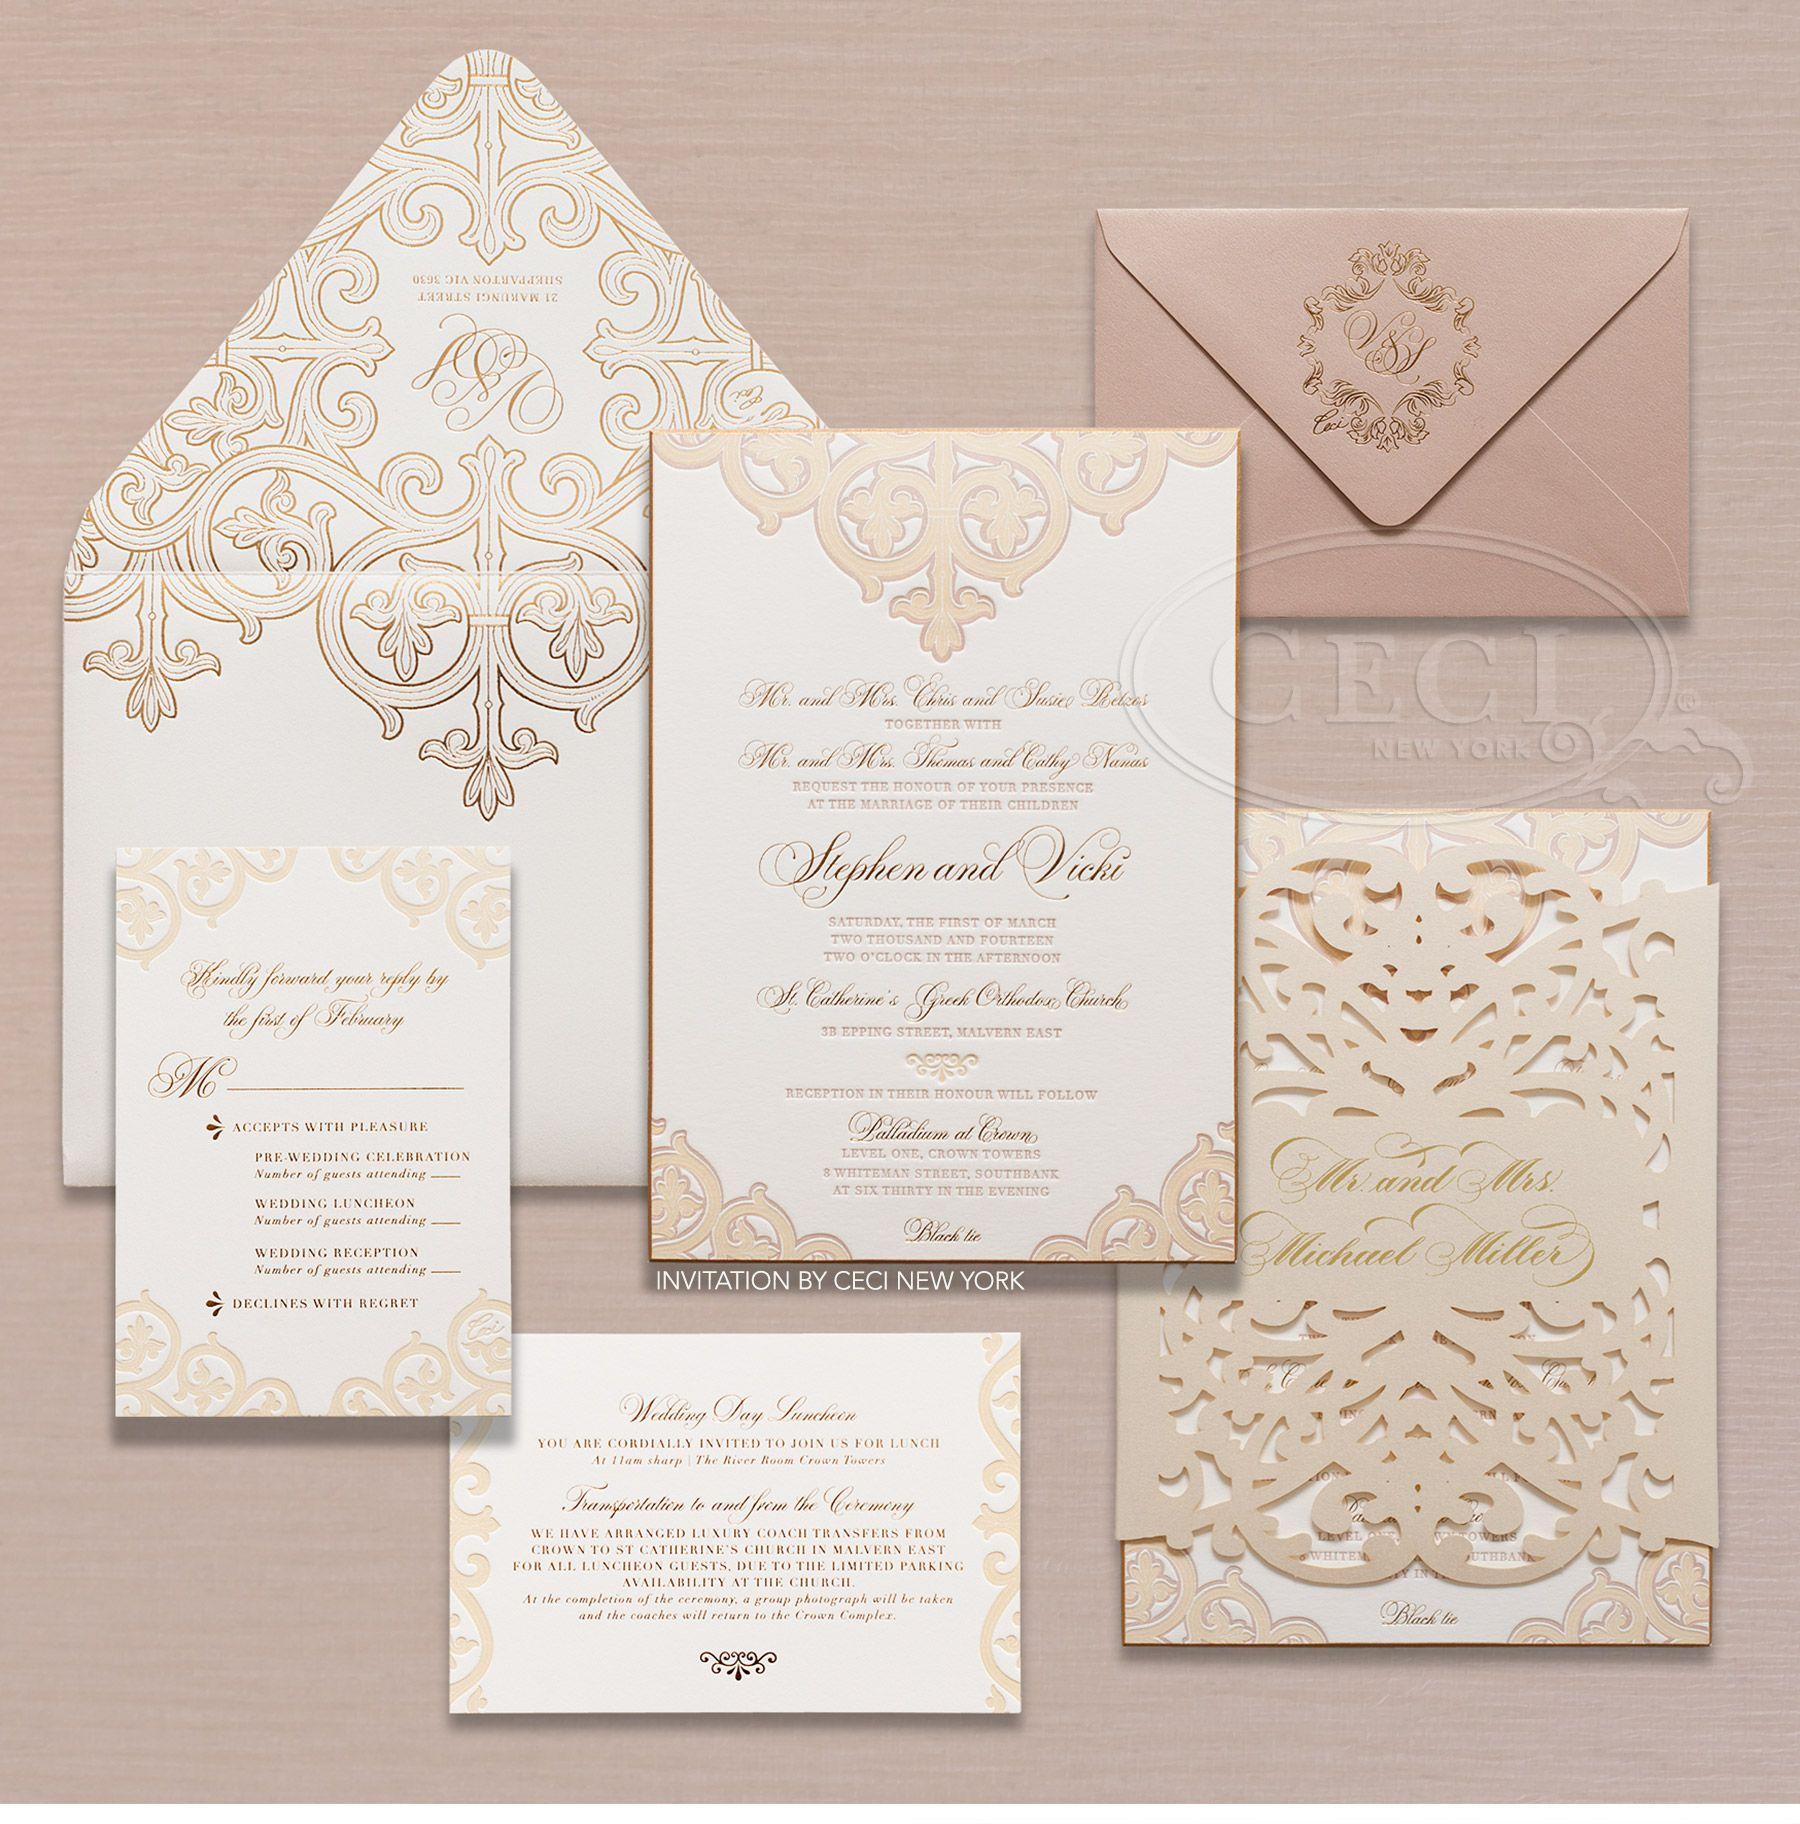 blush wedding invitations Luxury Wedding Invitations by Ceci New York Our Muse Fashion Inspired Wedding in